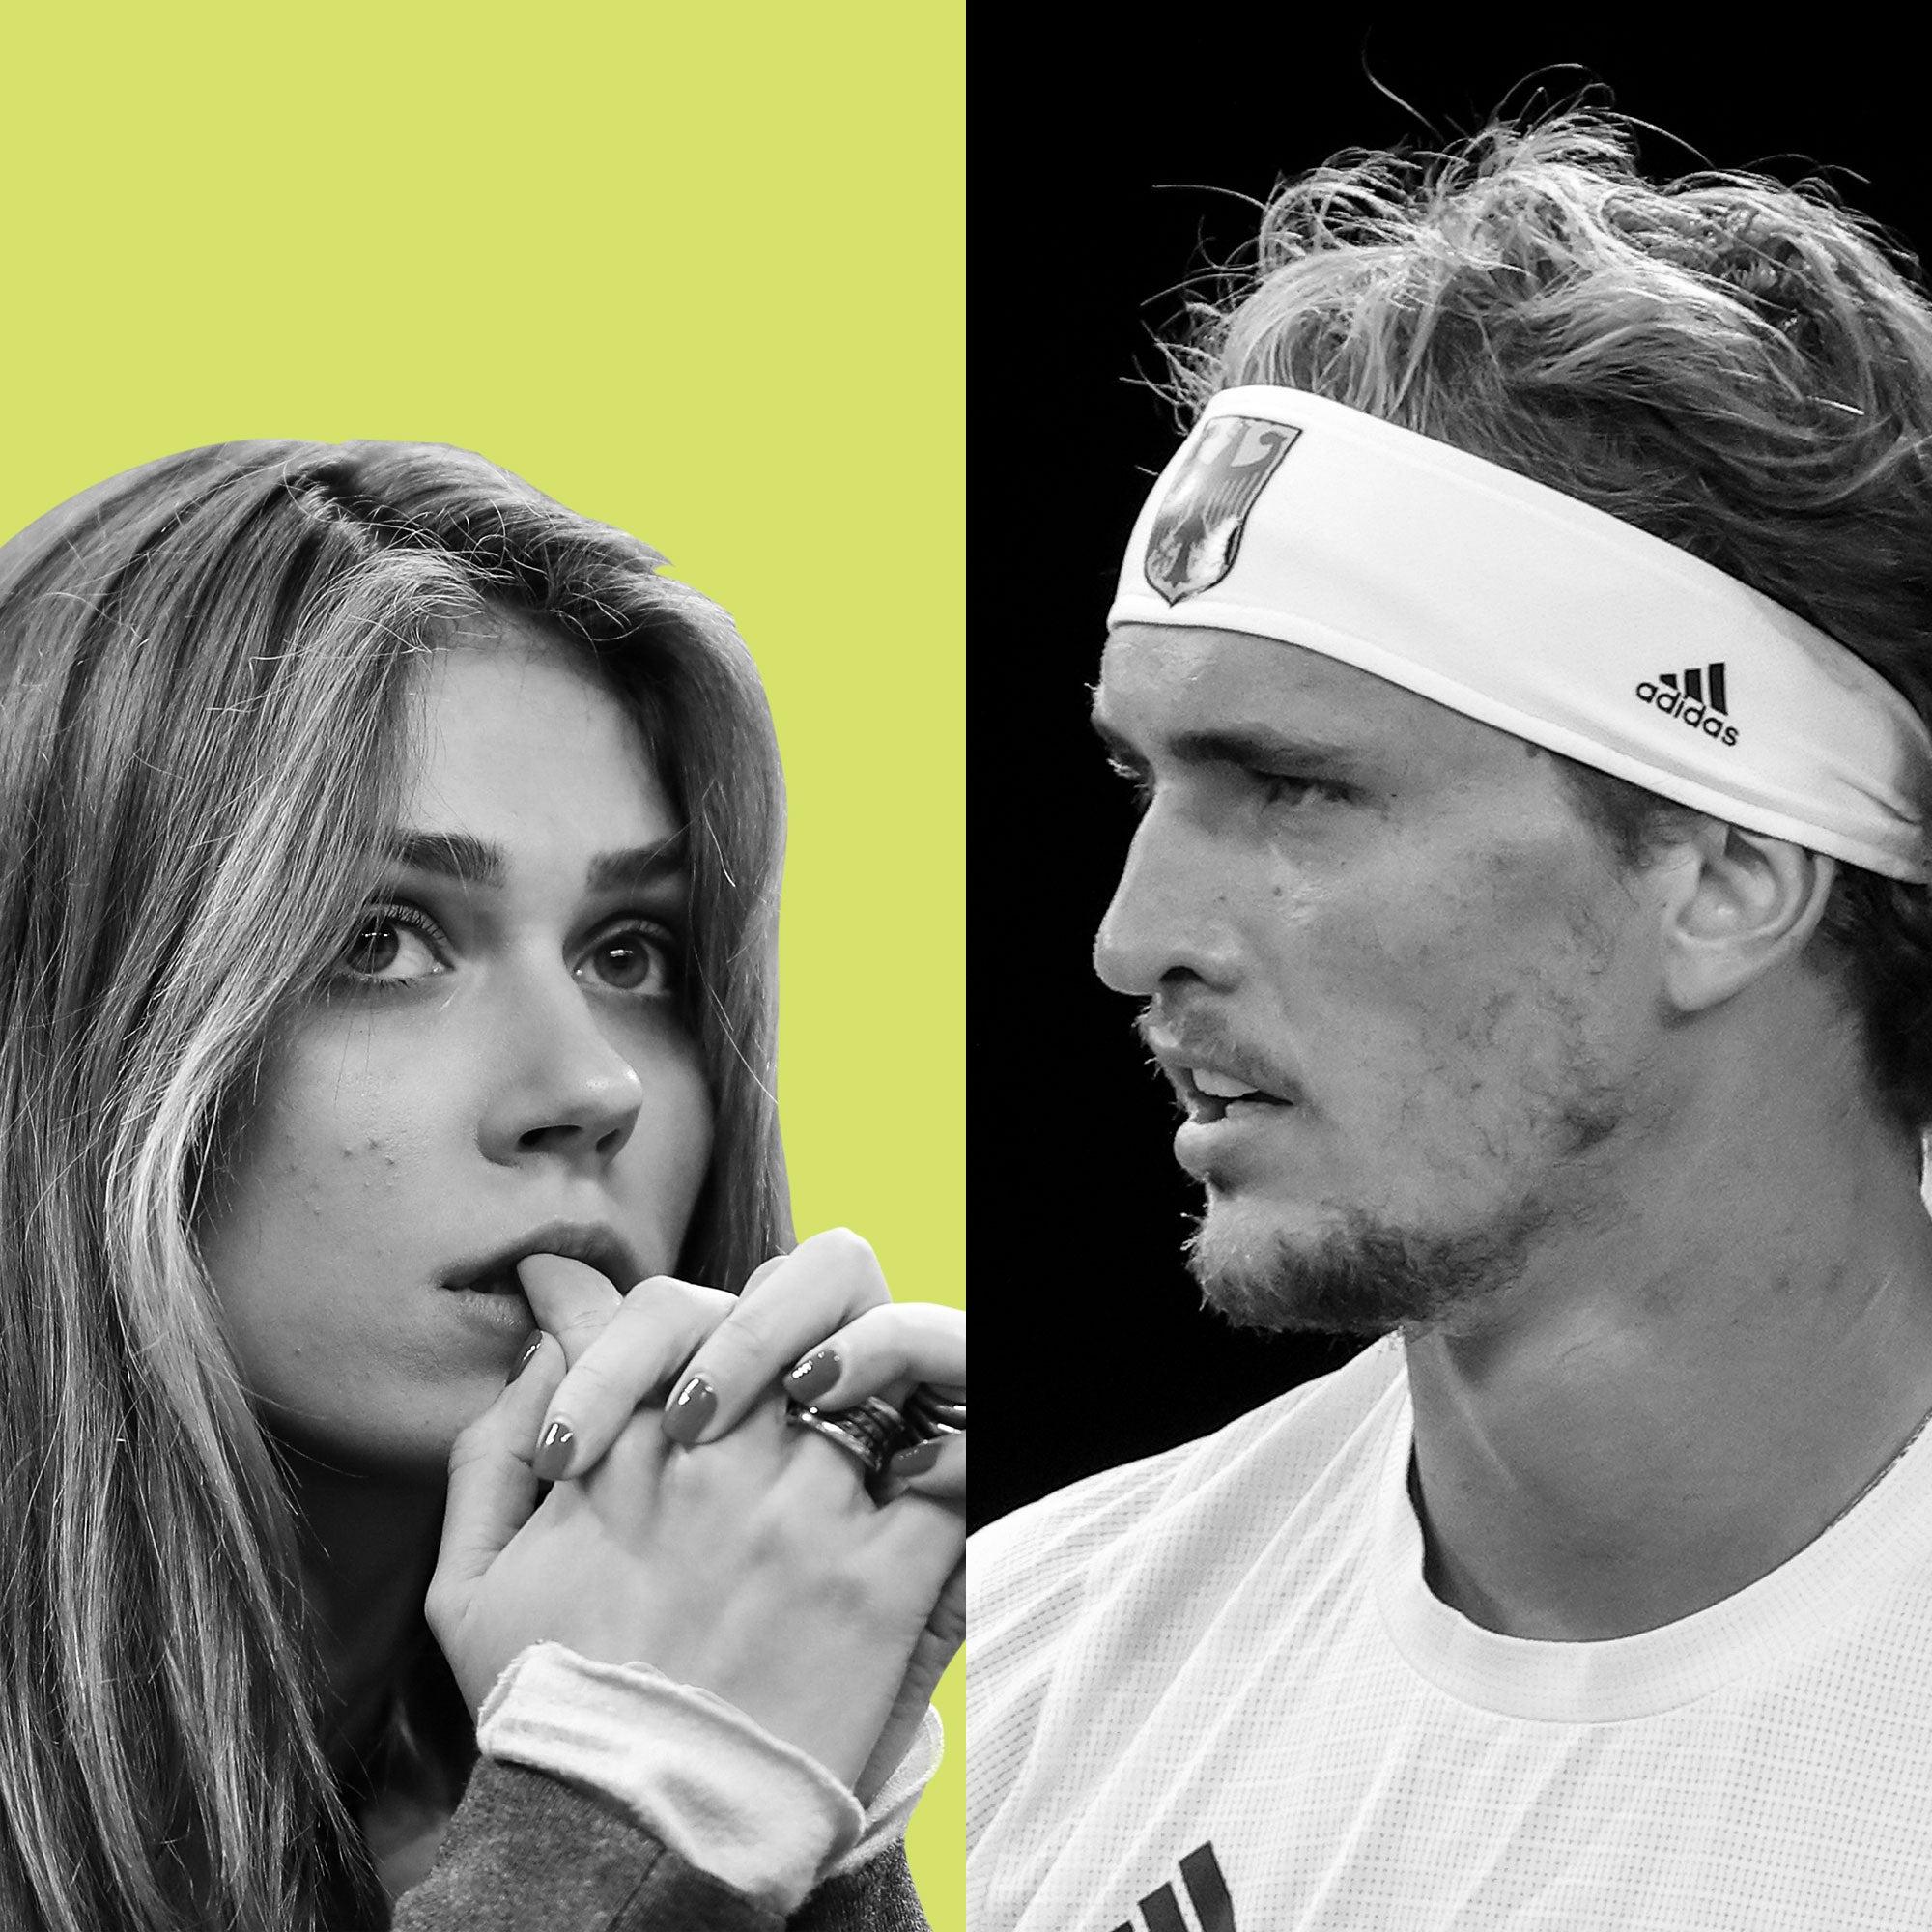 Side by side photos of Olga Sharypova and Alexander Zverev